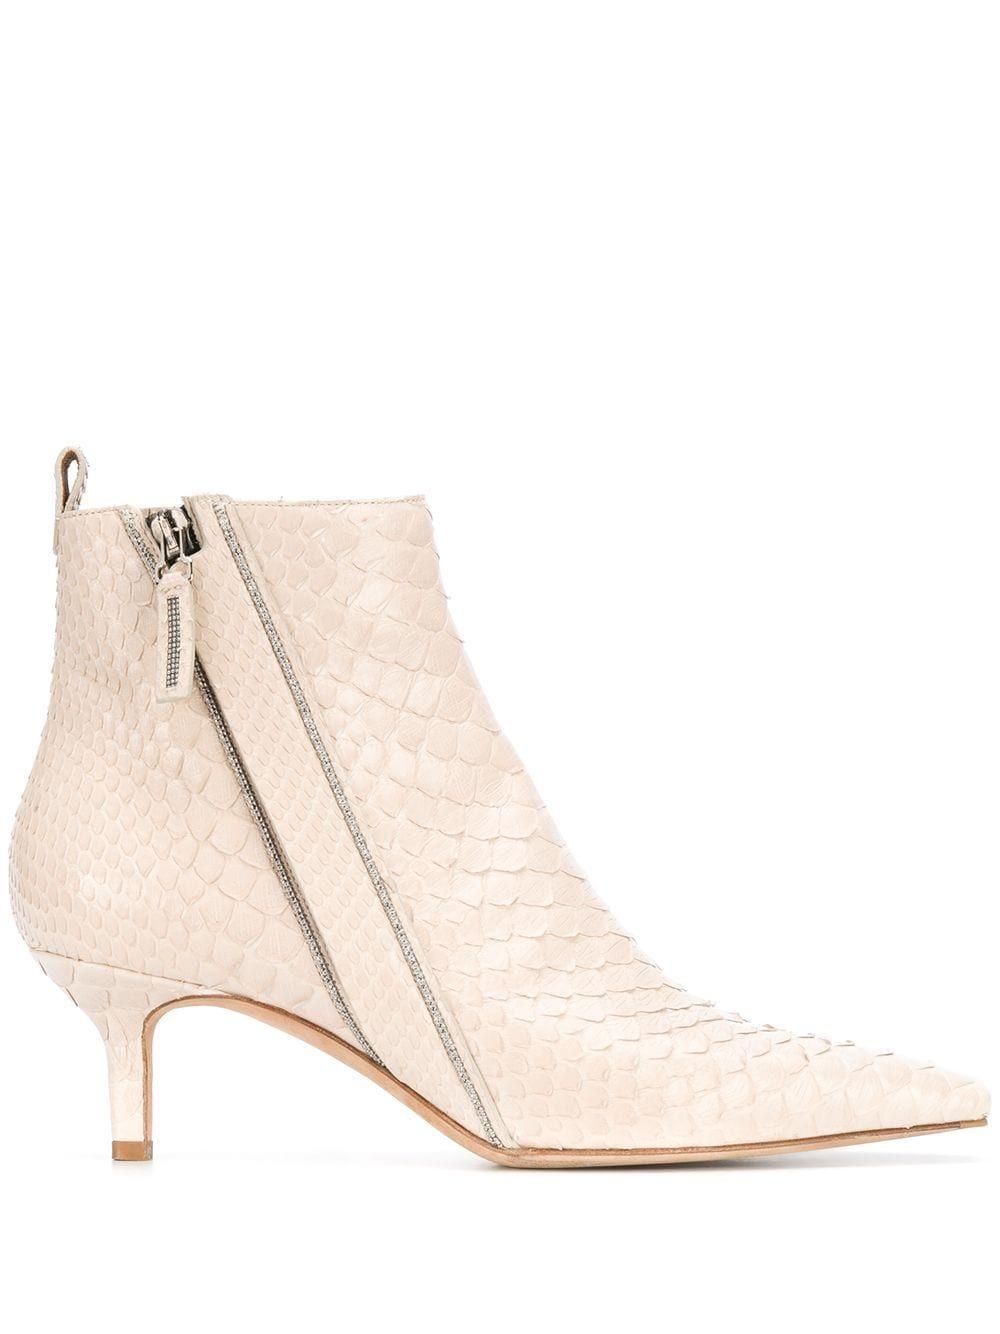 Brunello Cucinelli Embossed Kitten Heel Ankle Boots Brunellocucinelli Shoes In 2020 Kitten Heel Ankle Boots Boots Ankle Boots